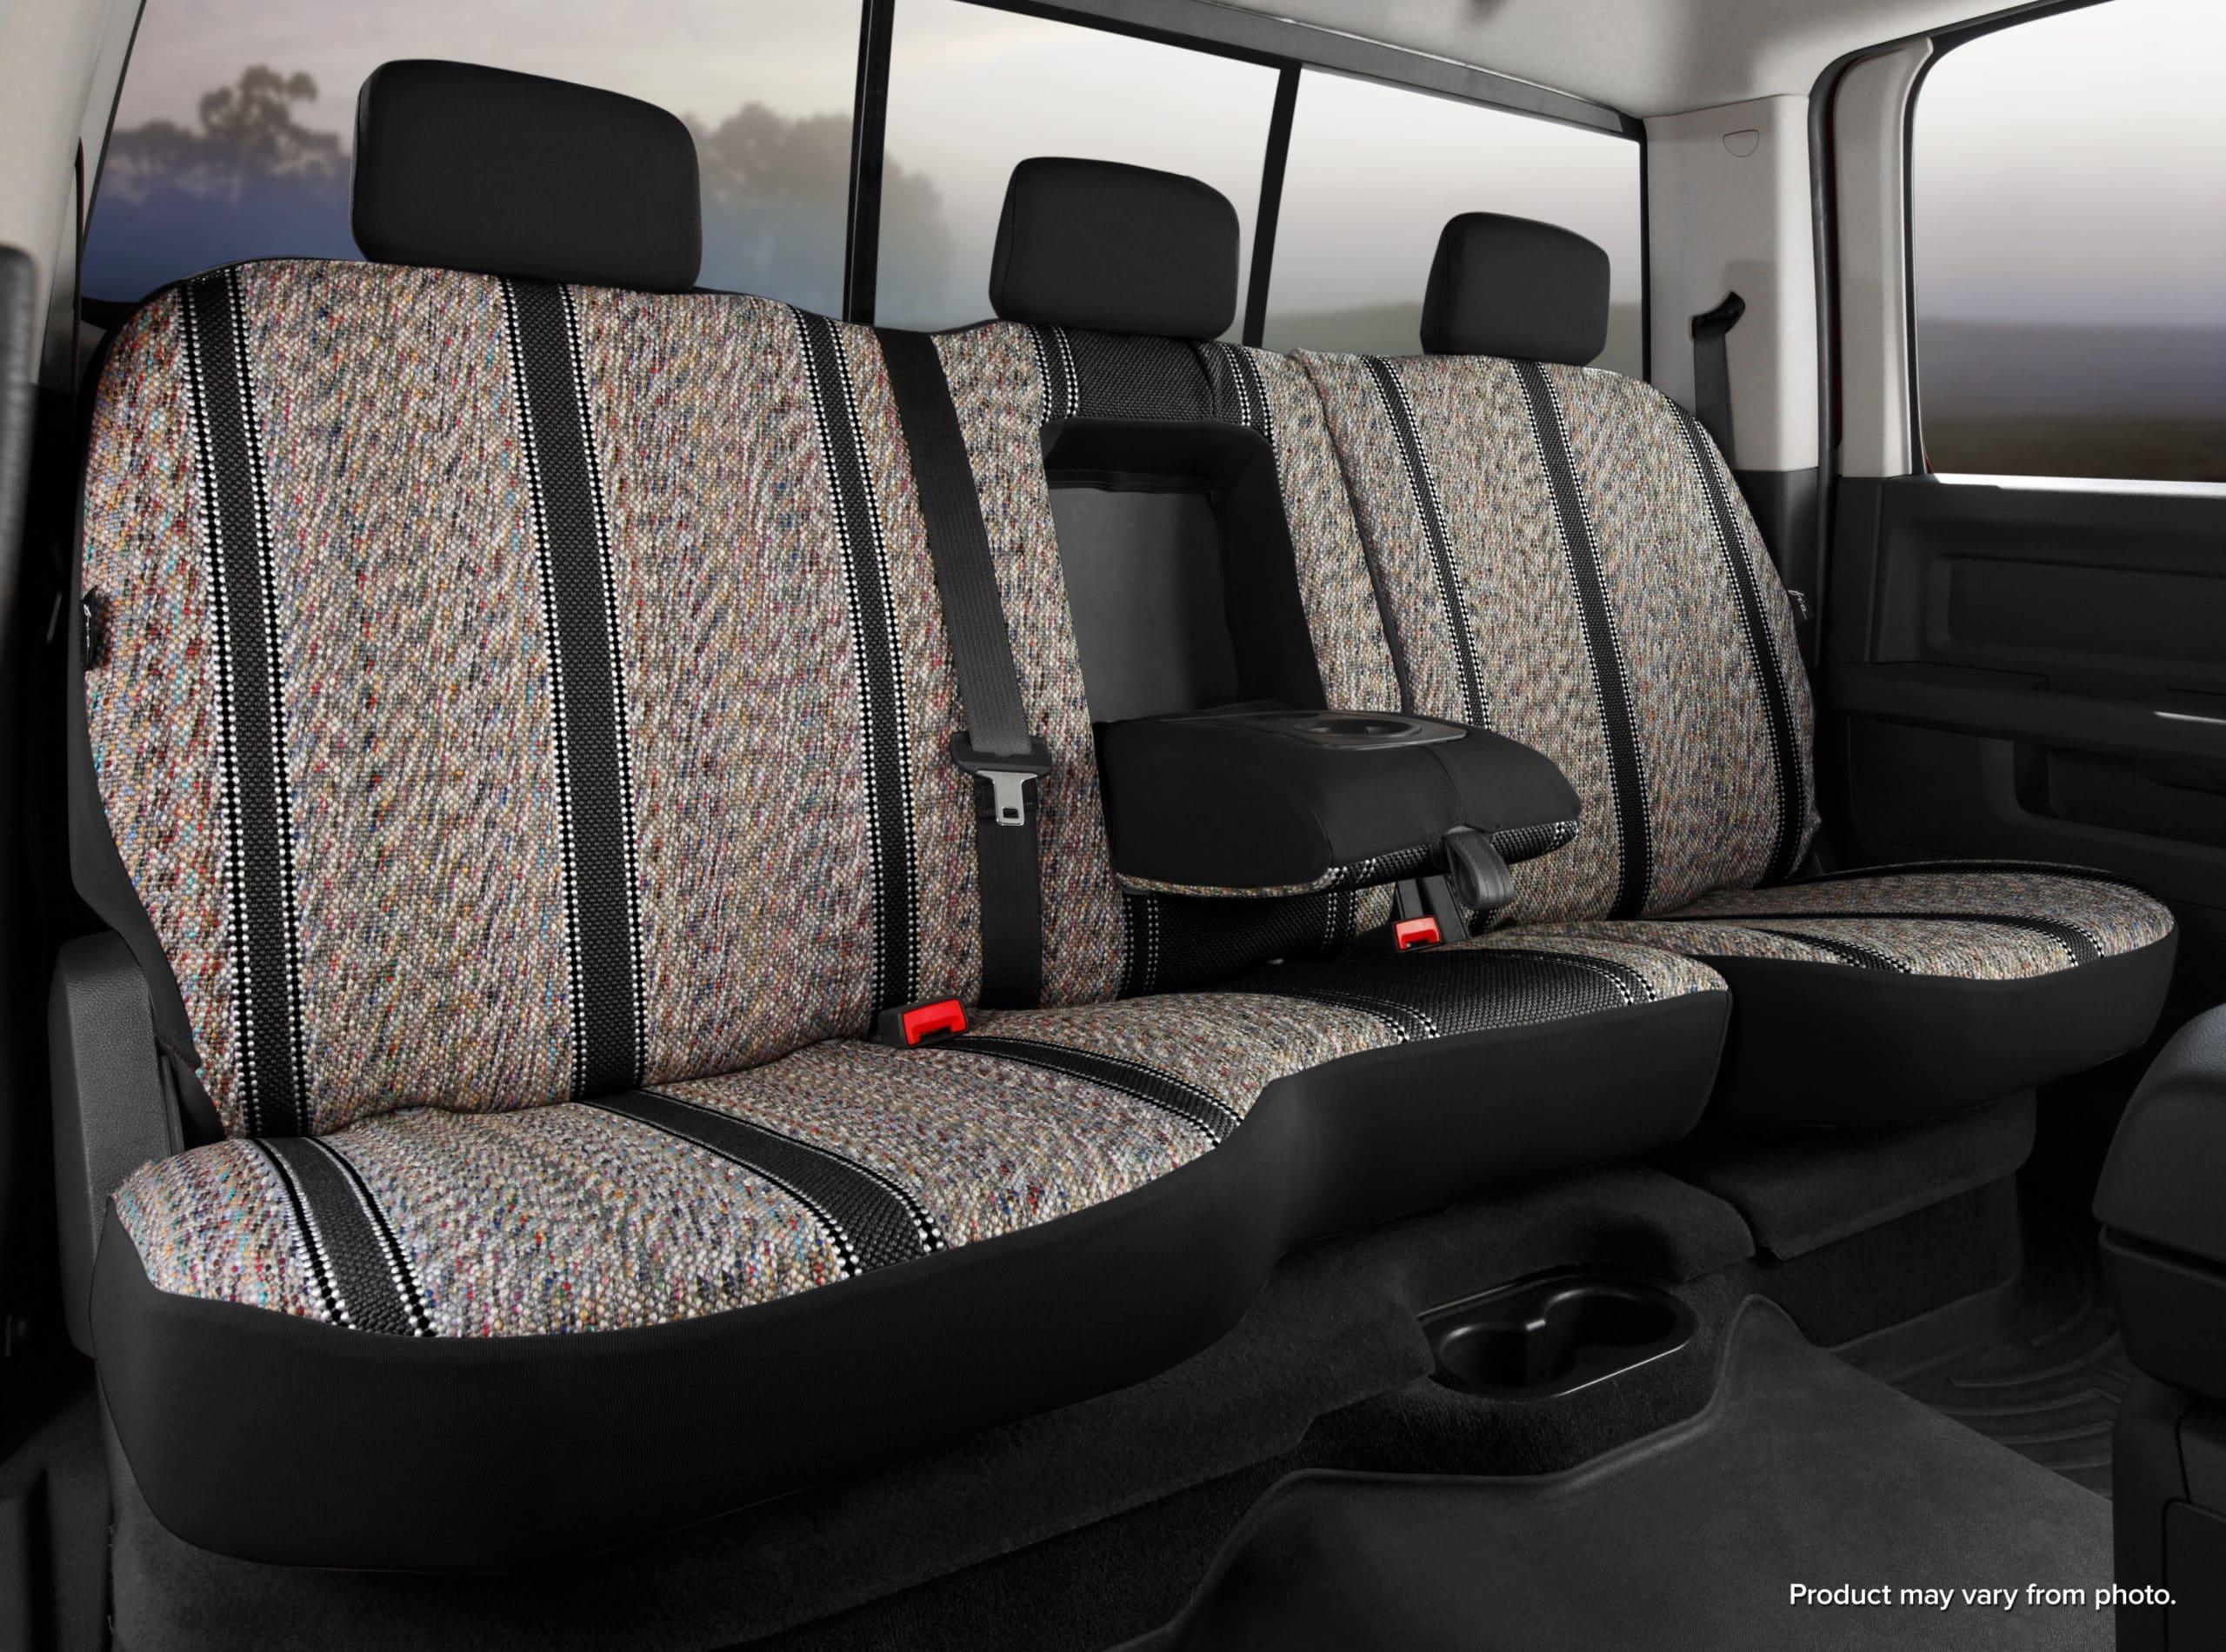 Fia Original Wrangler Seat Covers - Black- Rear Seats